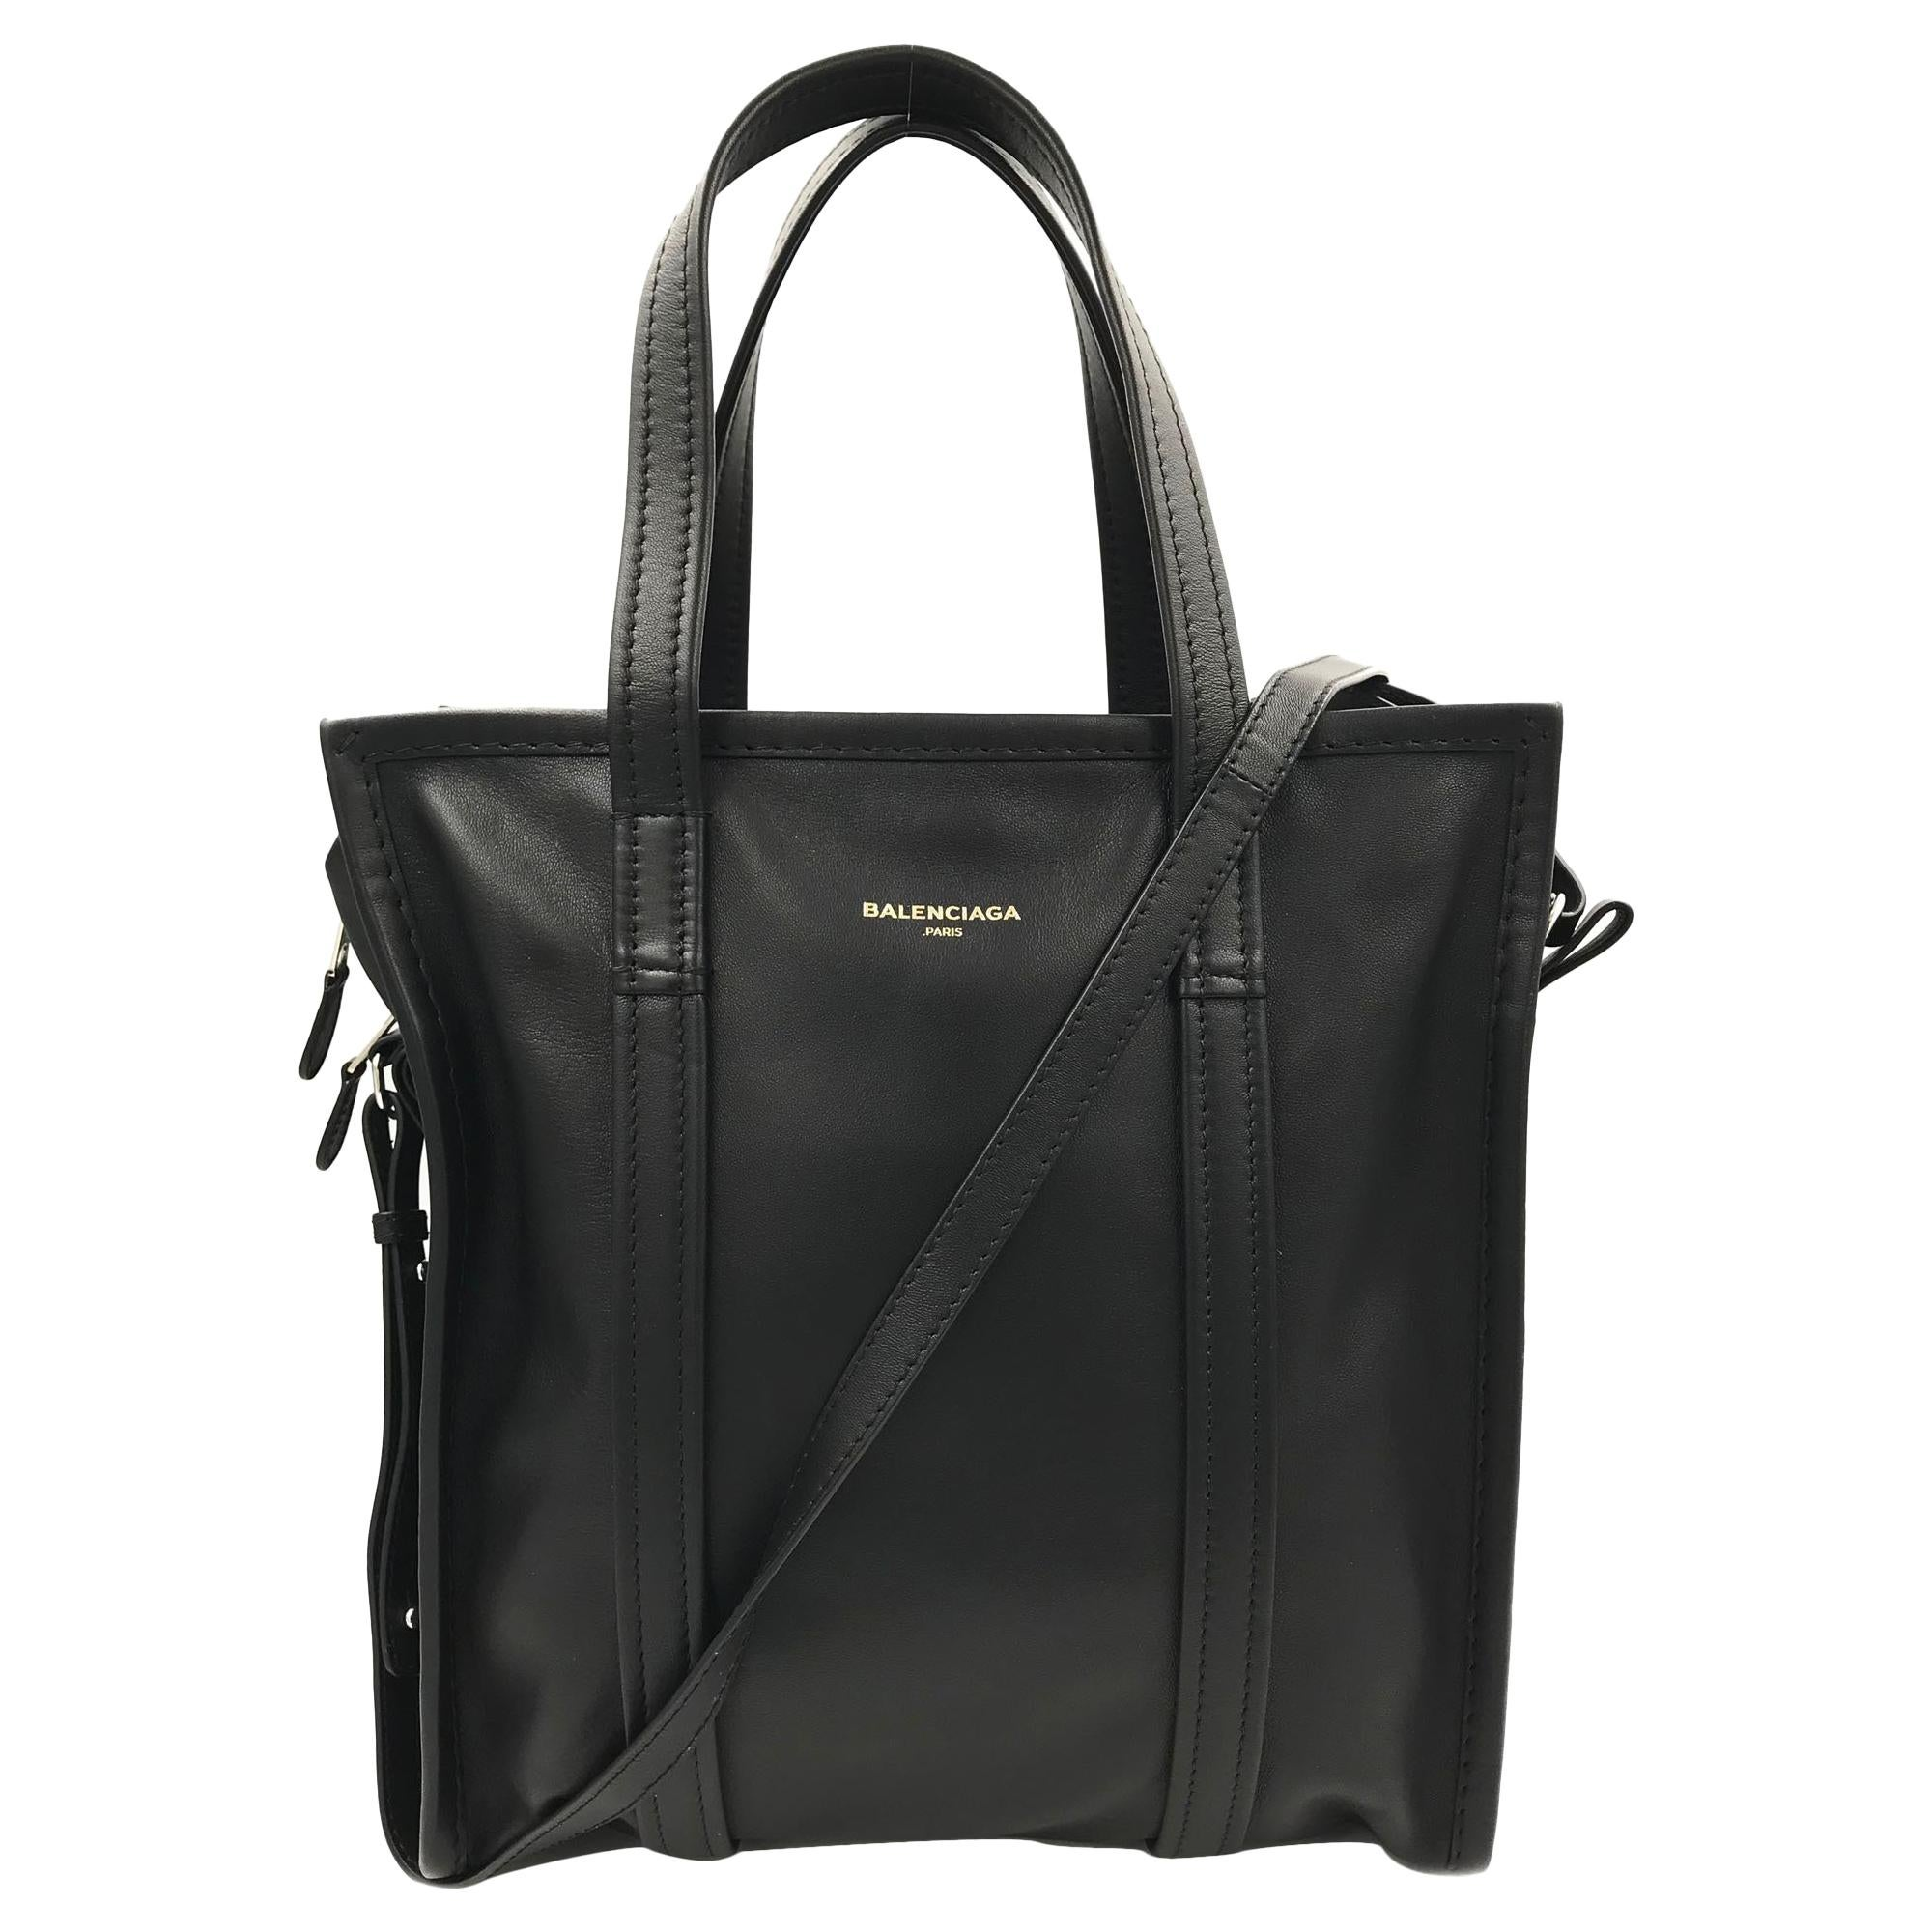 Balenciaga Paris Genuine Leather Ladies Handbag 443096 DL10N 1000